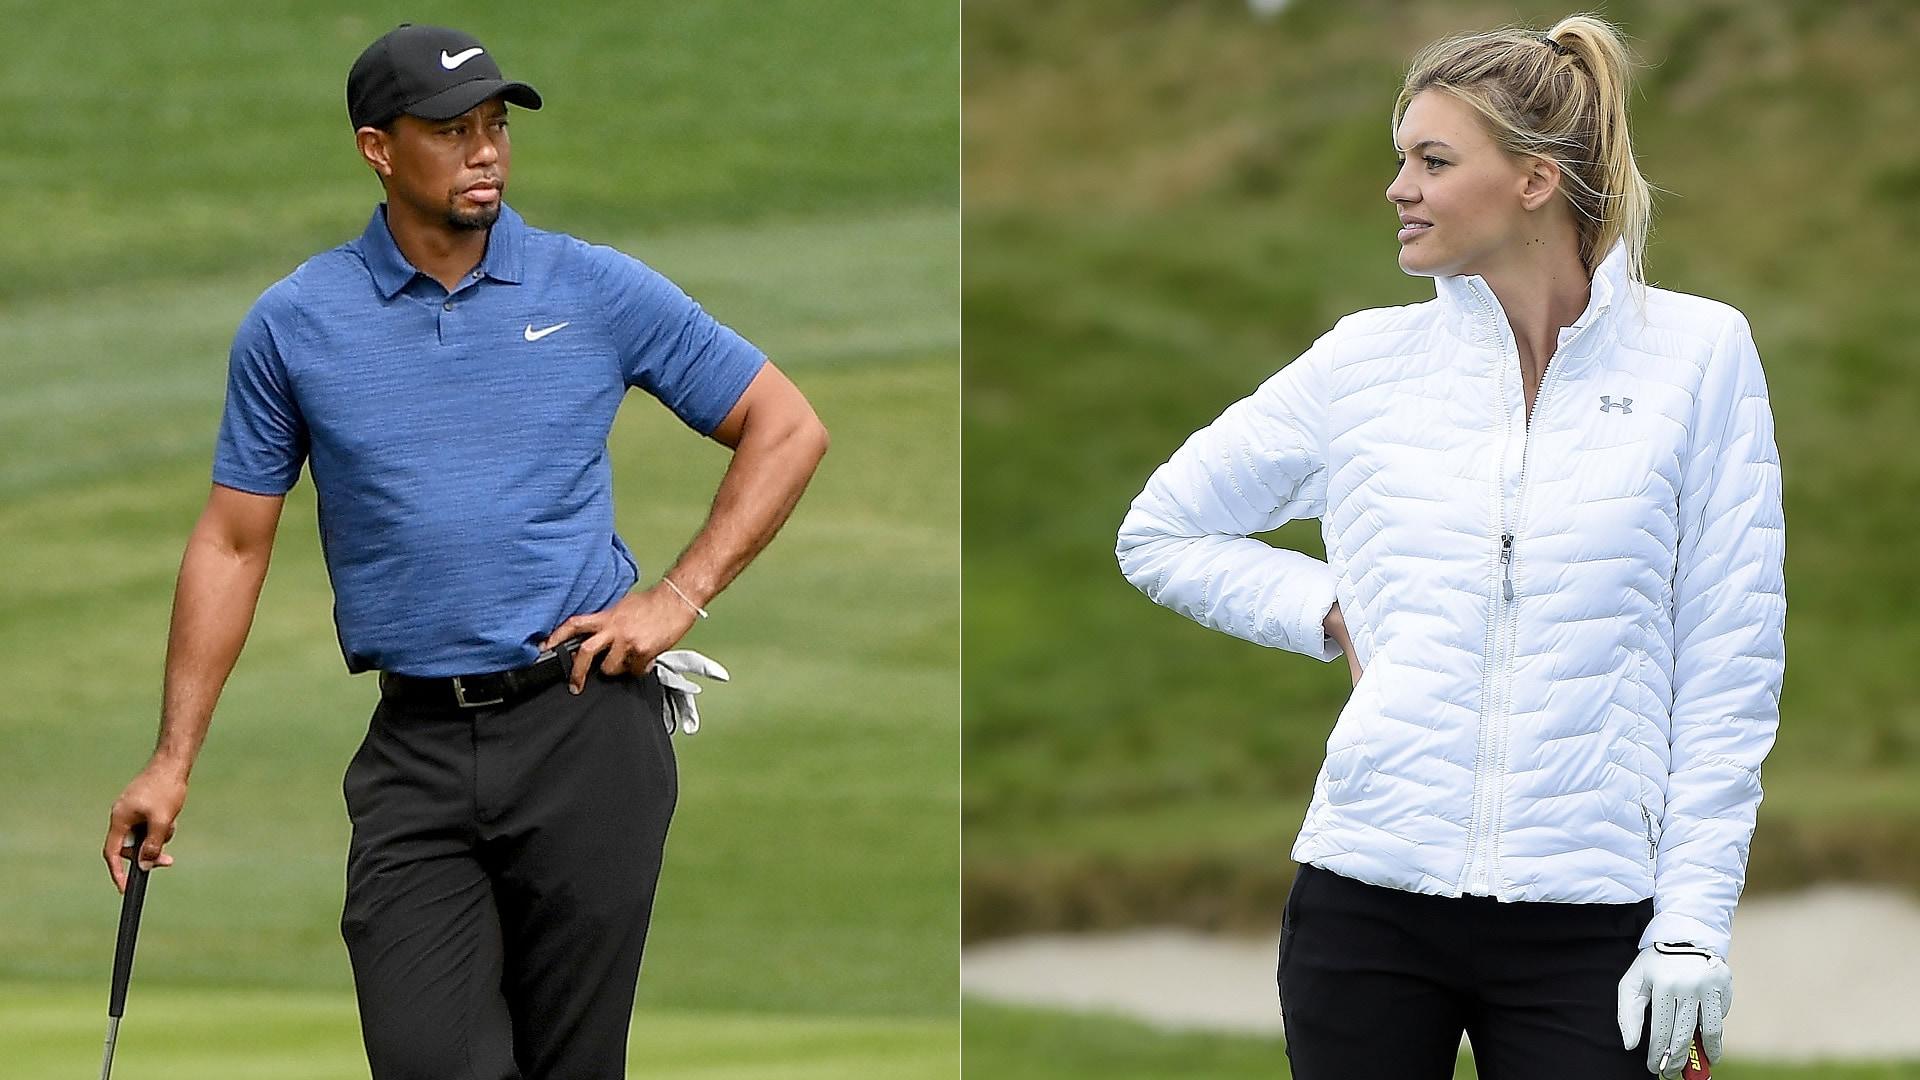 golf news on the latest tours  u0026 tournaments